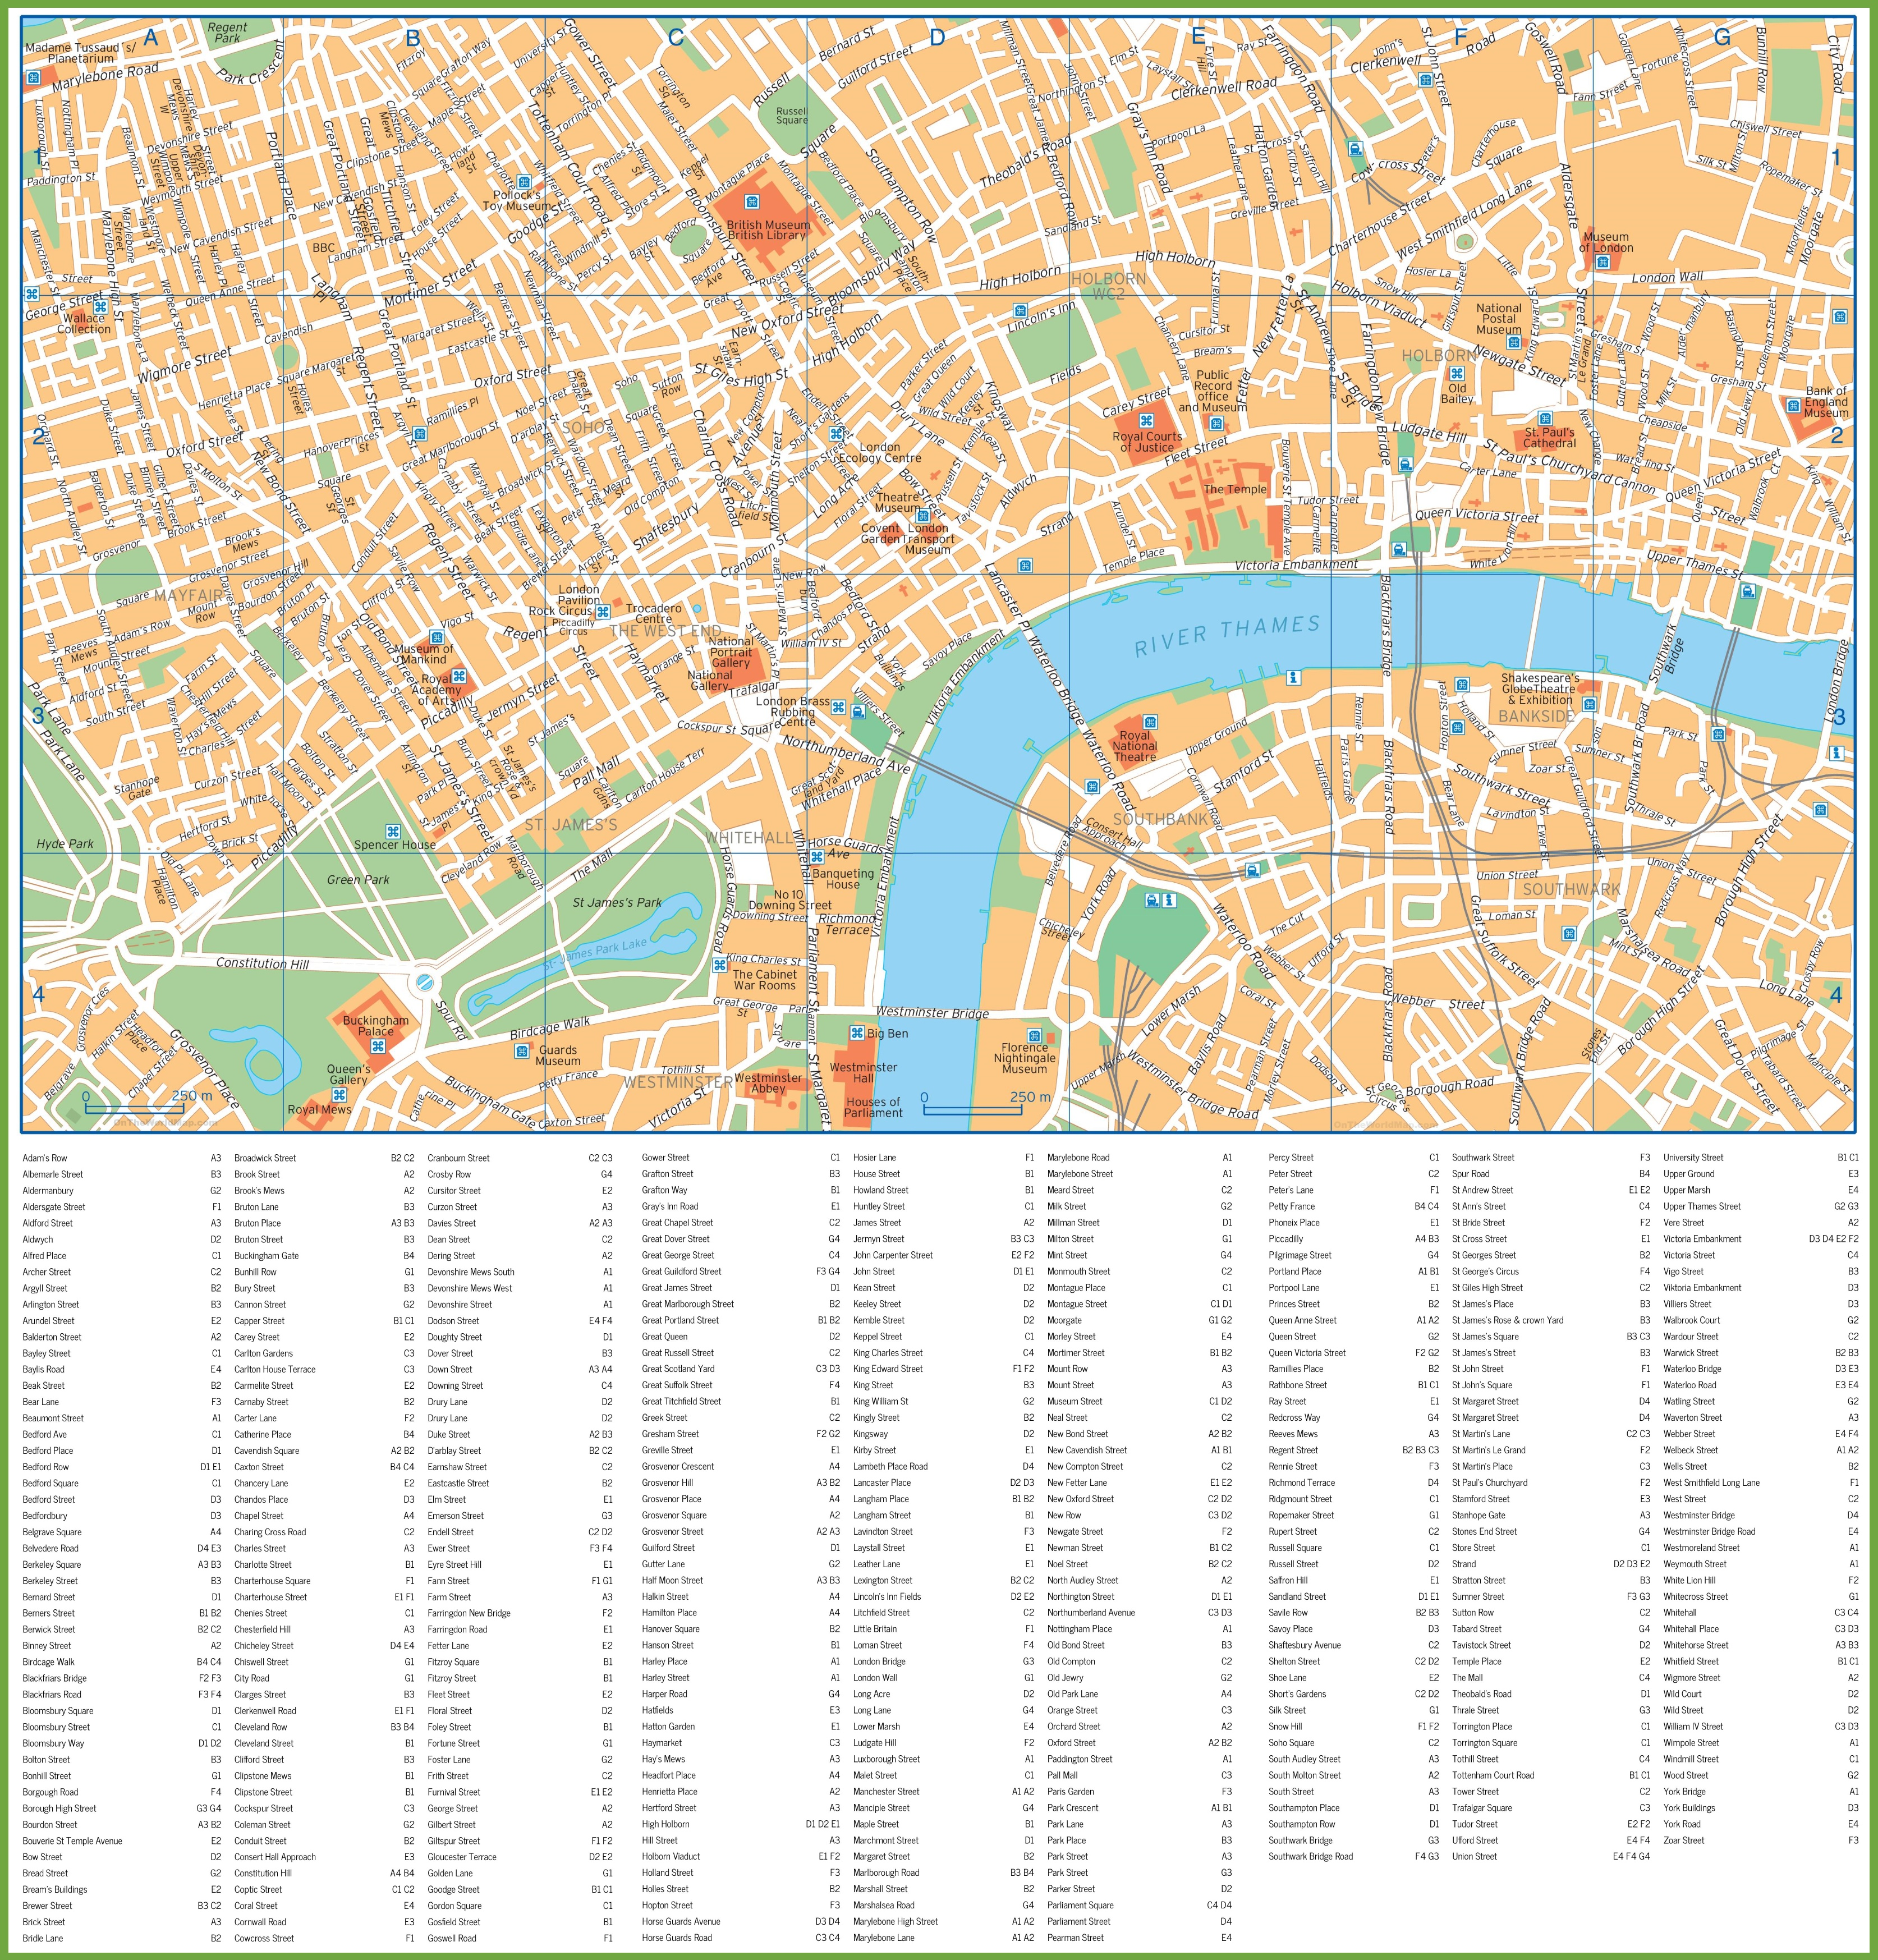 Street Map Of London Uk.London Street Map